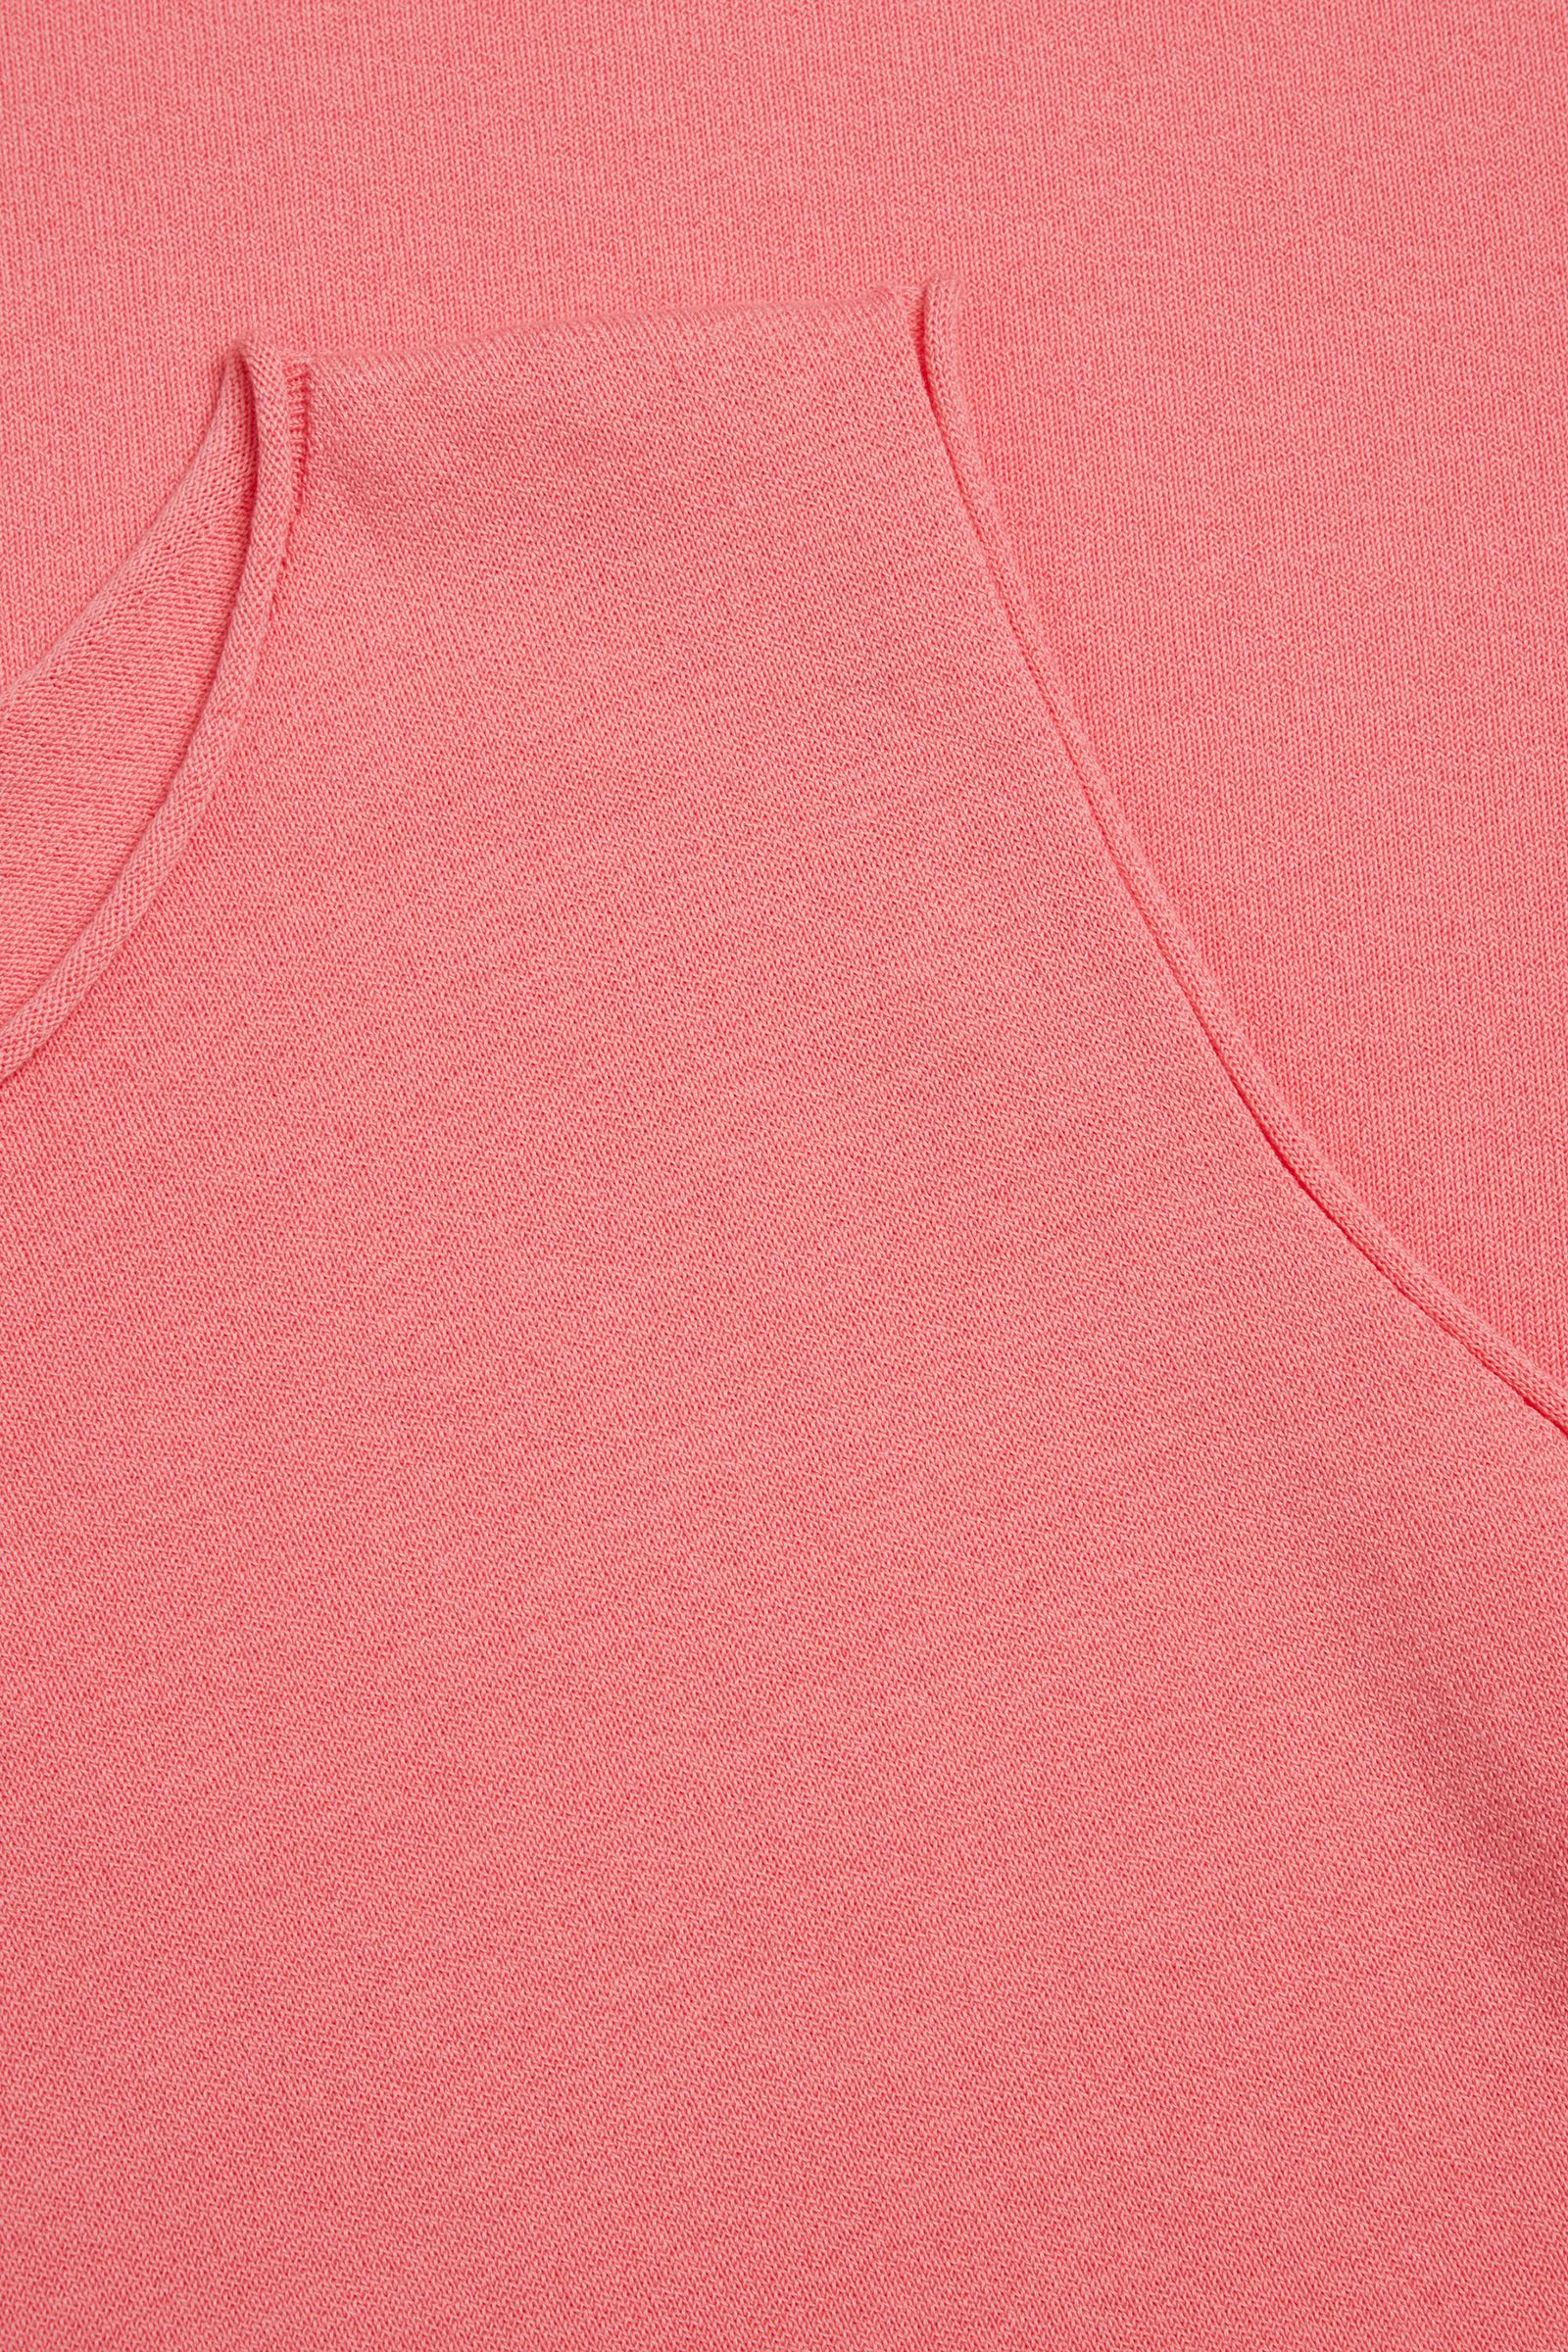 COS 오가닉 코튼 니티드 슬리브리스 드레스의 핑크컬러 Detail입니다.